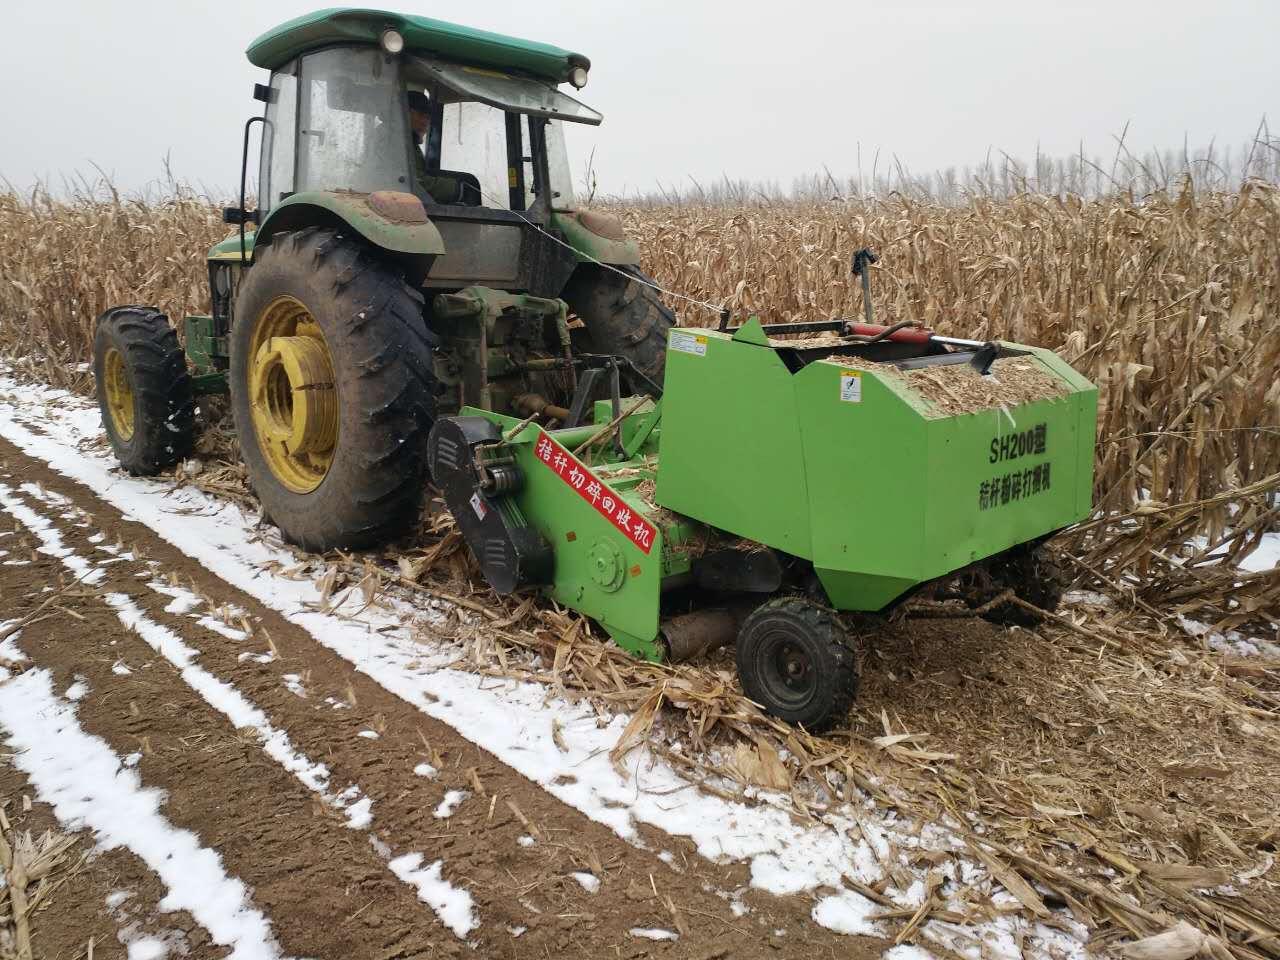 stf50-80 玉米秸秆回收打捆机 黄储秸秆粉碎打捆机